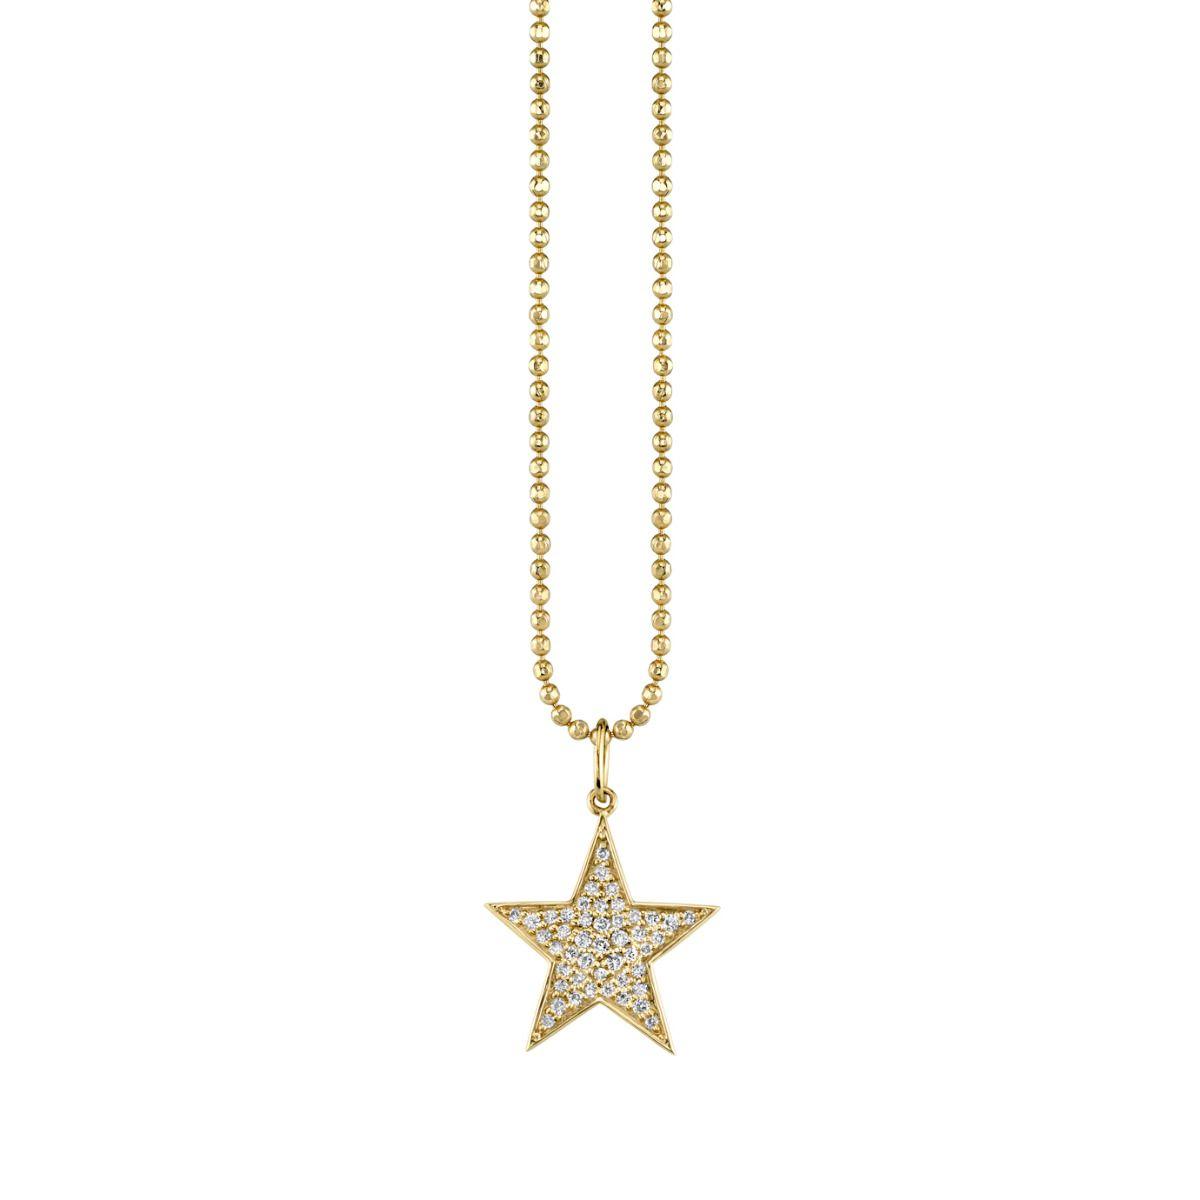 Medium Yellow Gold & Diamond Star Charm Necklace Within Newest Medium Diamond Necklaces (Gallery 25 of 25)